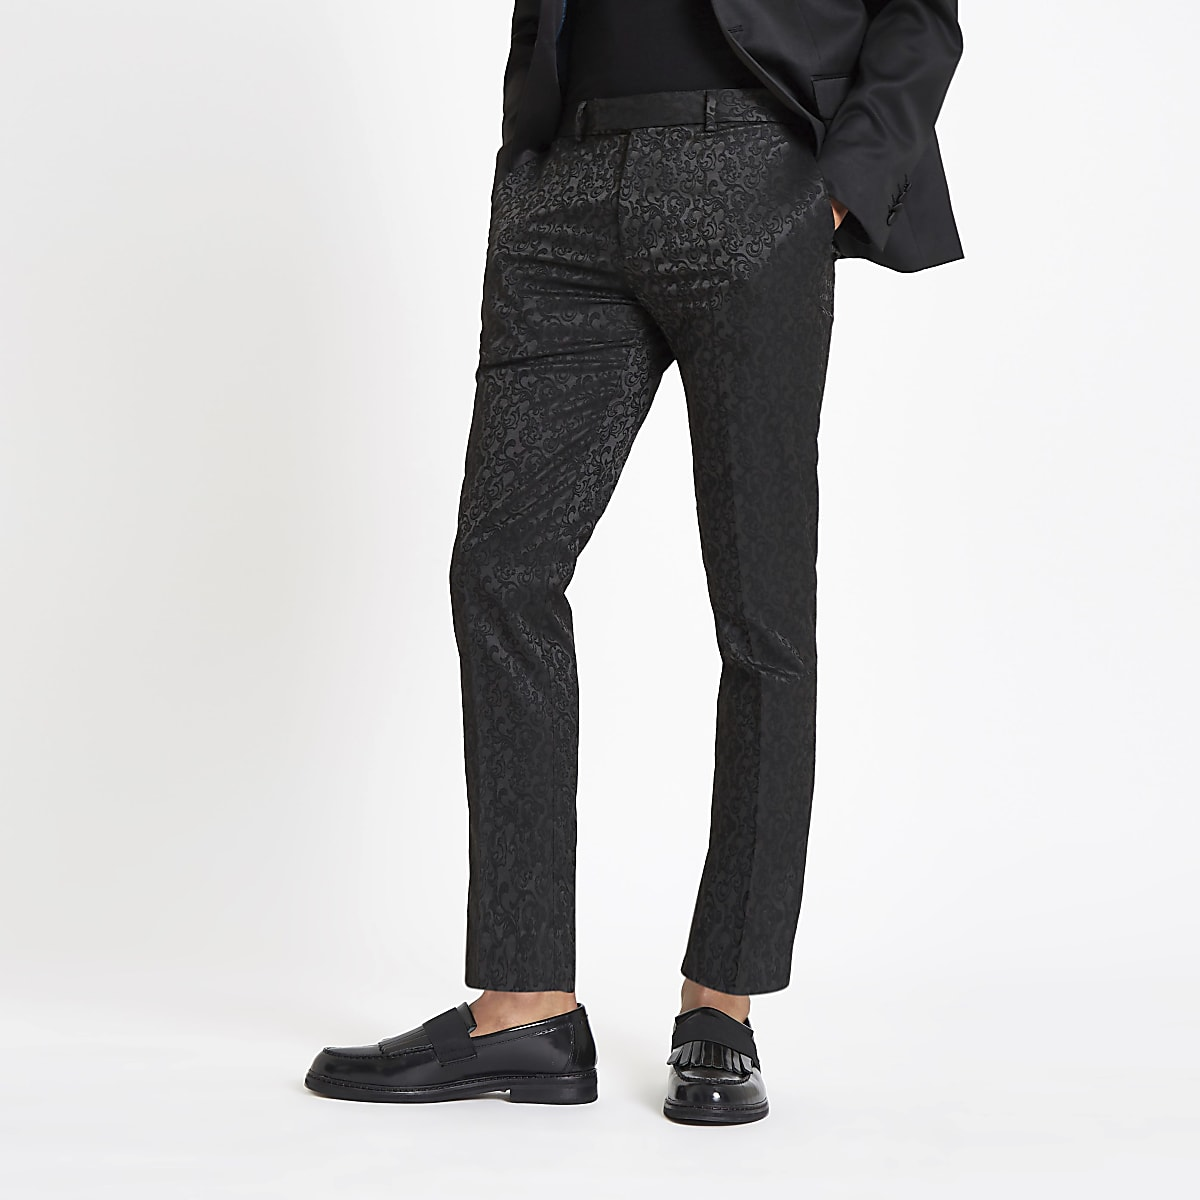 Black jacquard stretch skinny smart trousers